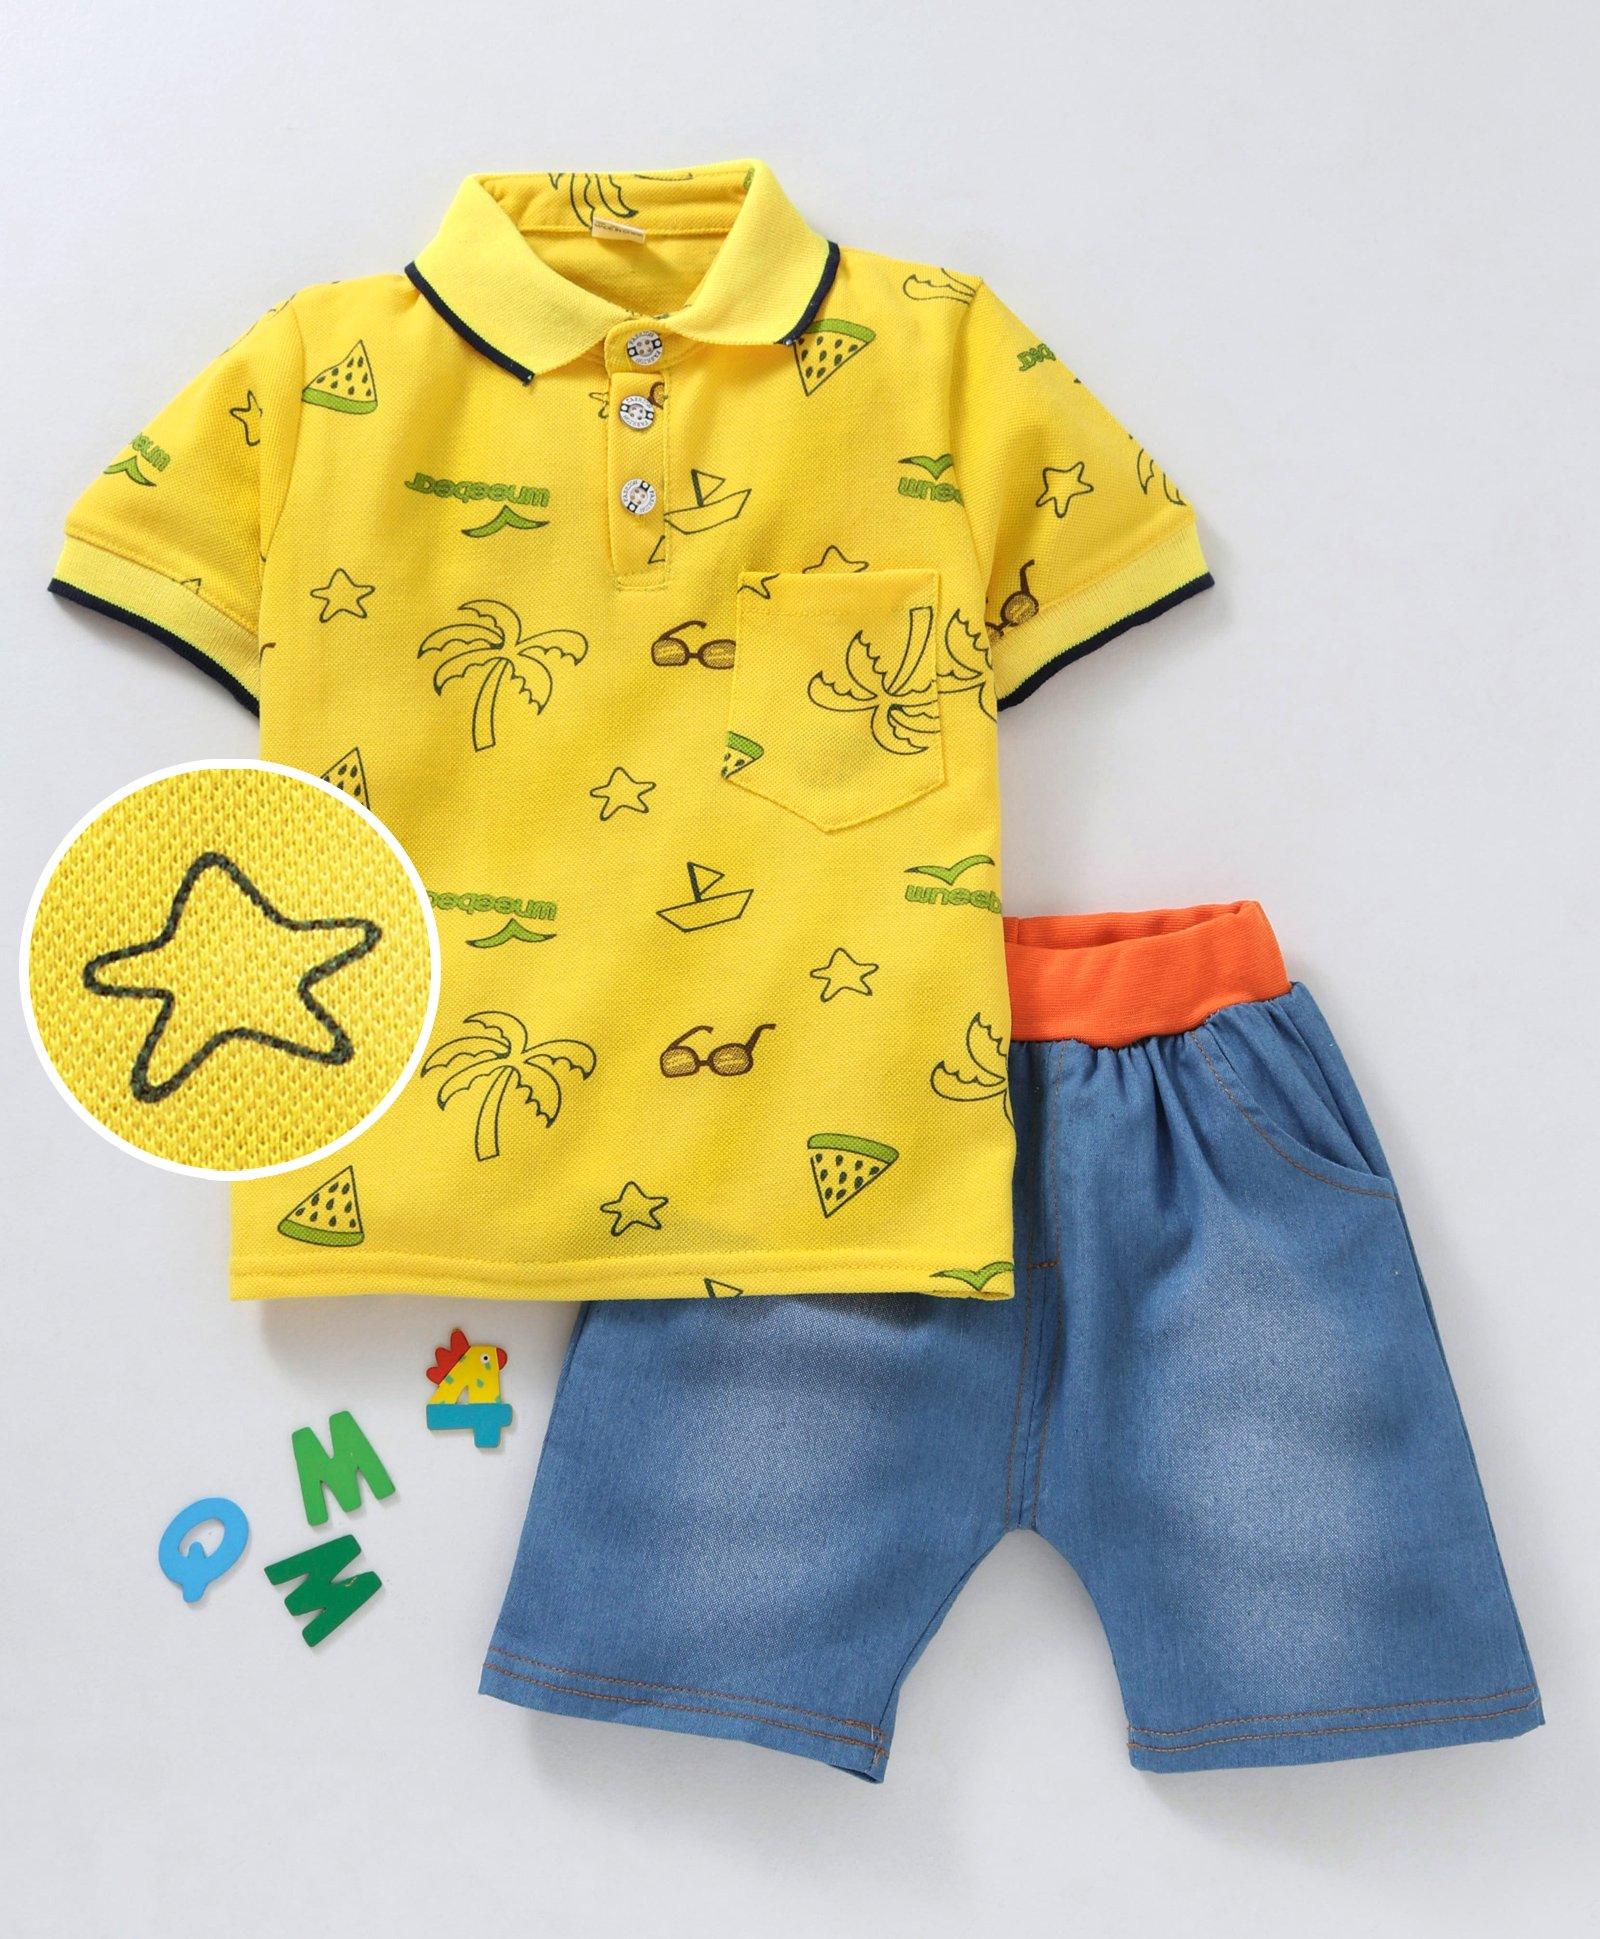 6fee567dd5e9 Buy Kookie Kids Half Sleeves Printed Polo Tee   Denim Shorts ...